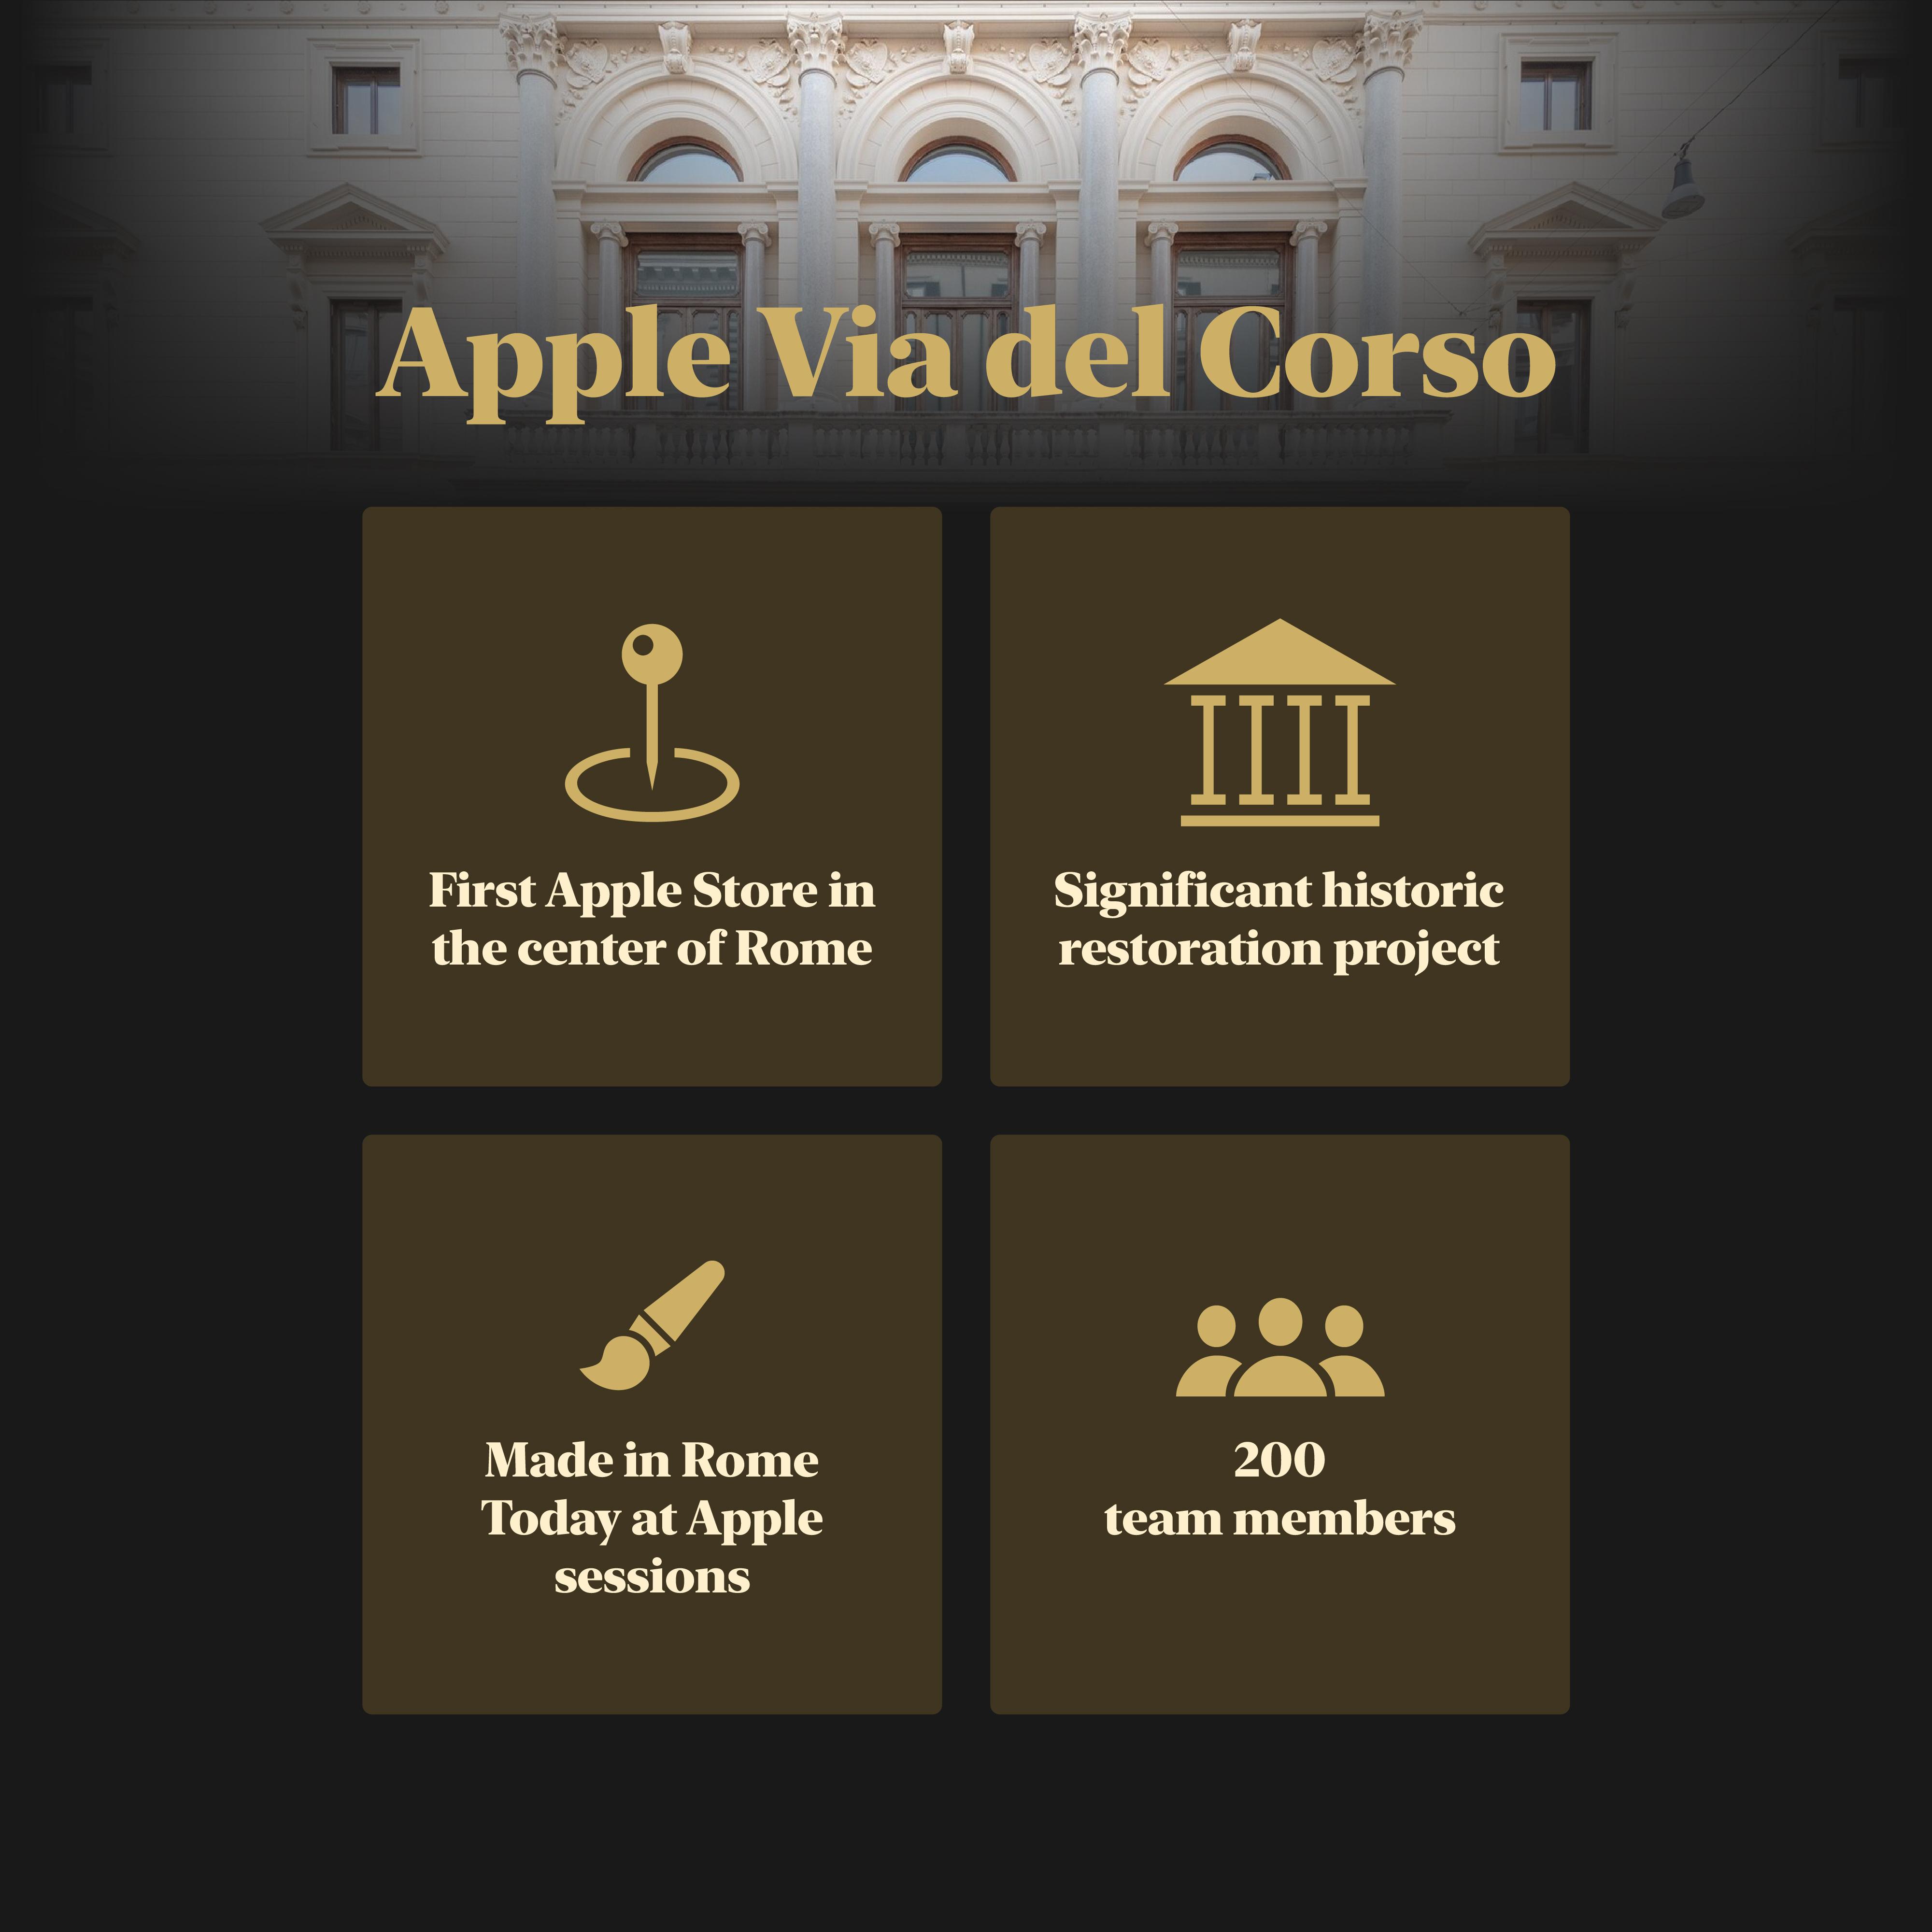 Sekilas tentang Apple Via del Corso